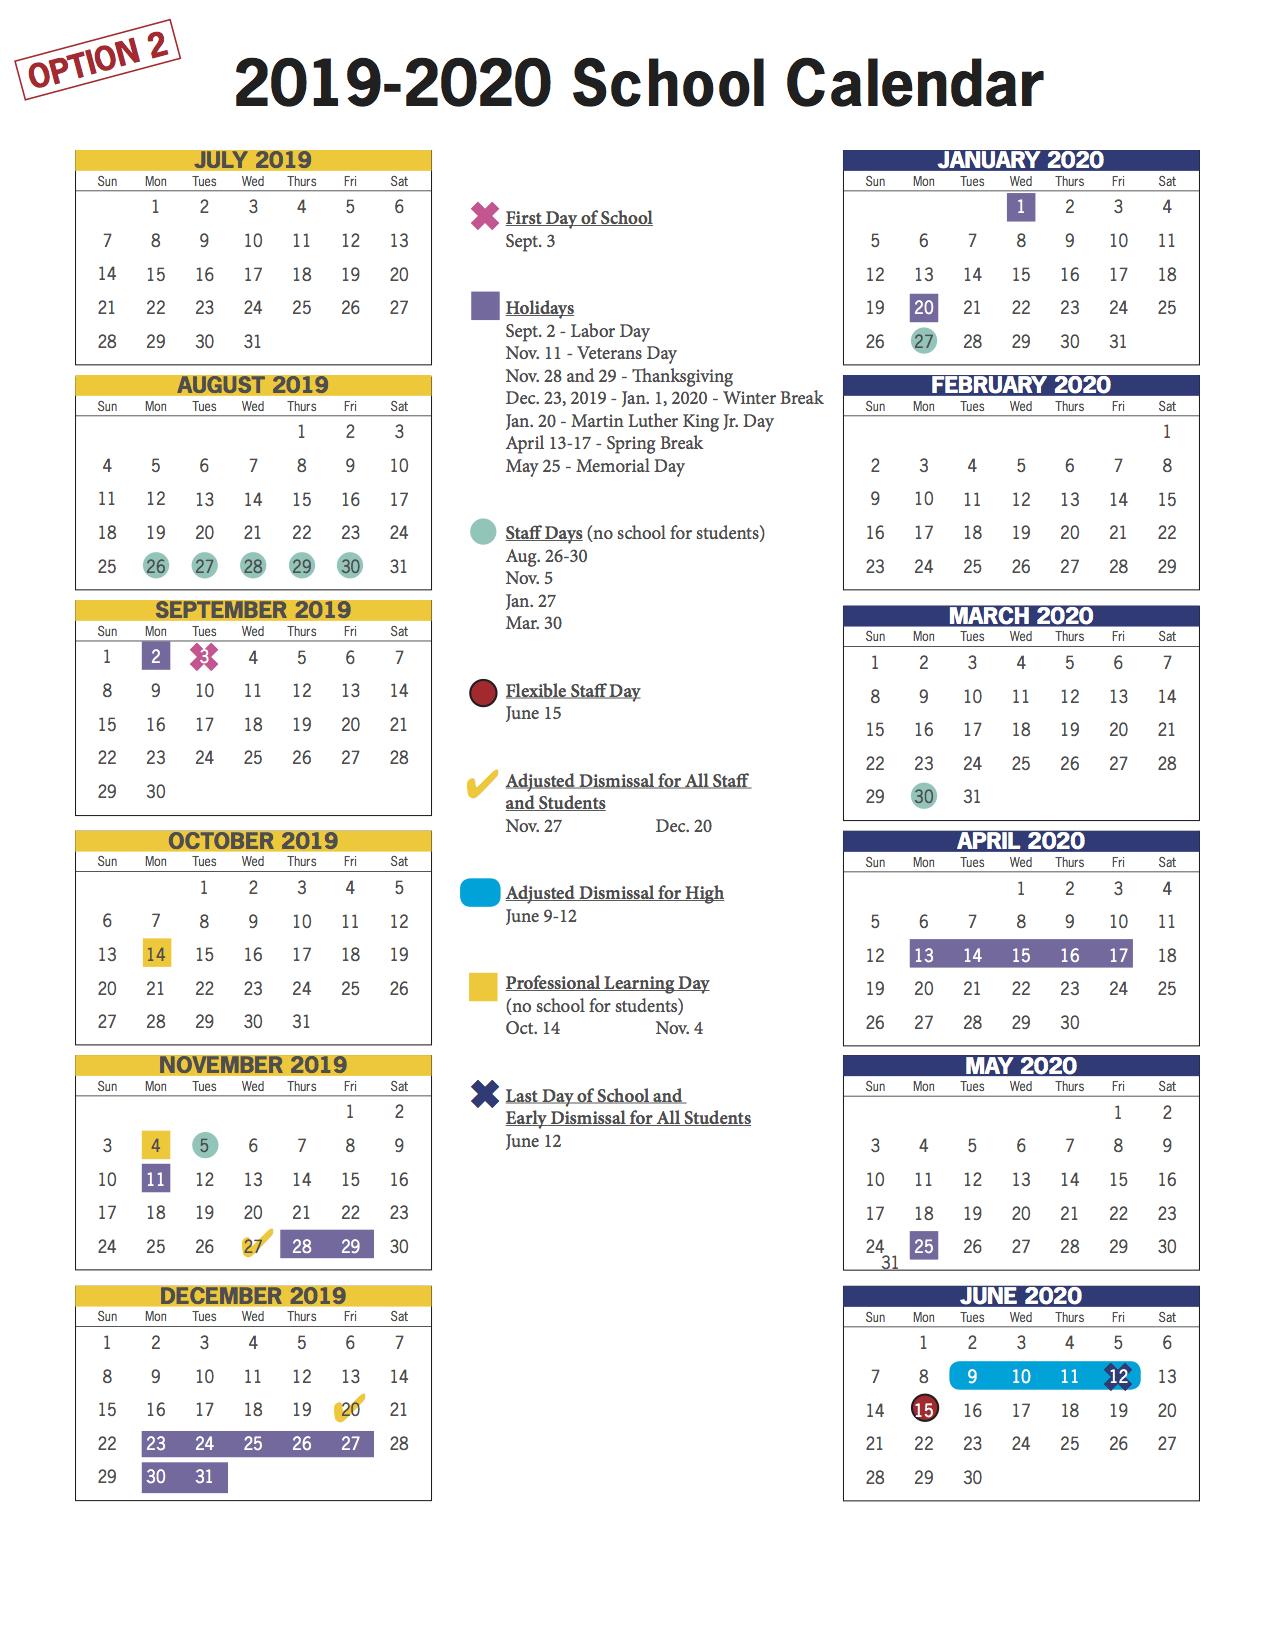 Vbcps E-Town Hall - 2018-2019 And 2019-2020 School Calendar regarding Va Beach Schools Staff Calendar